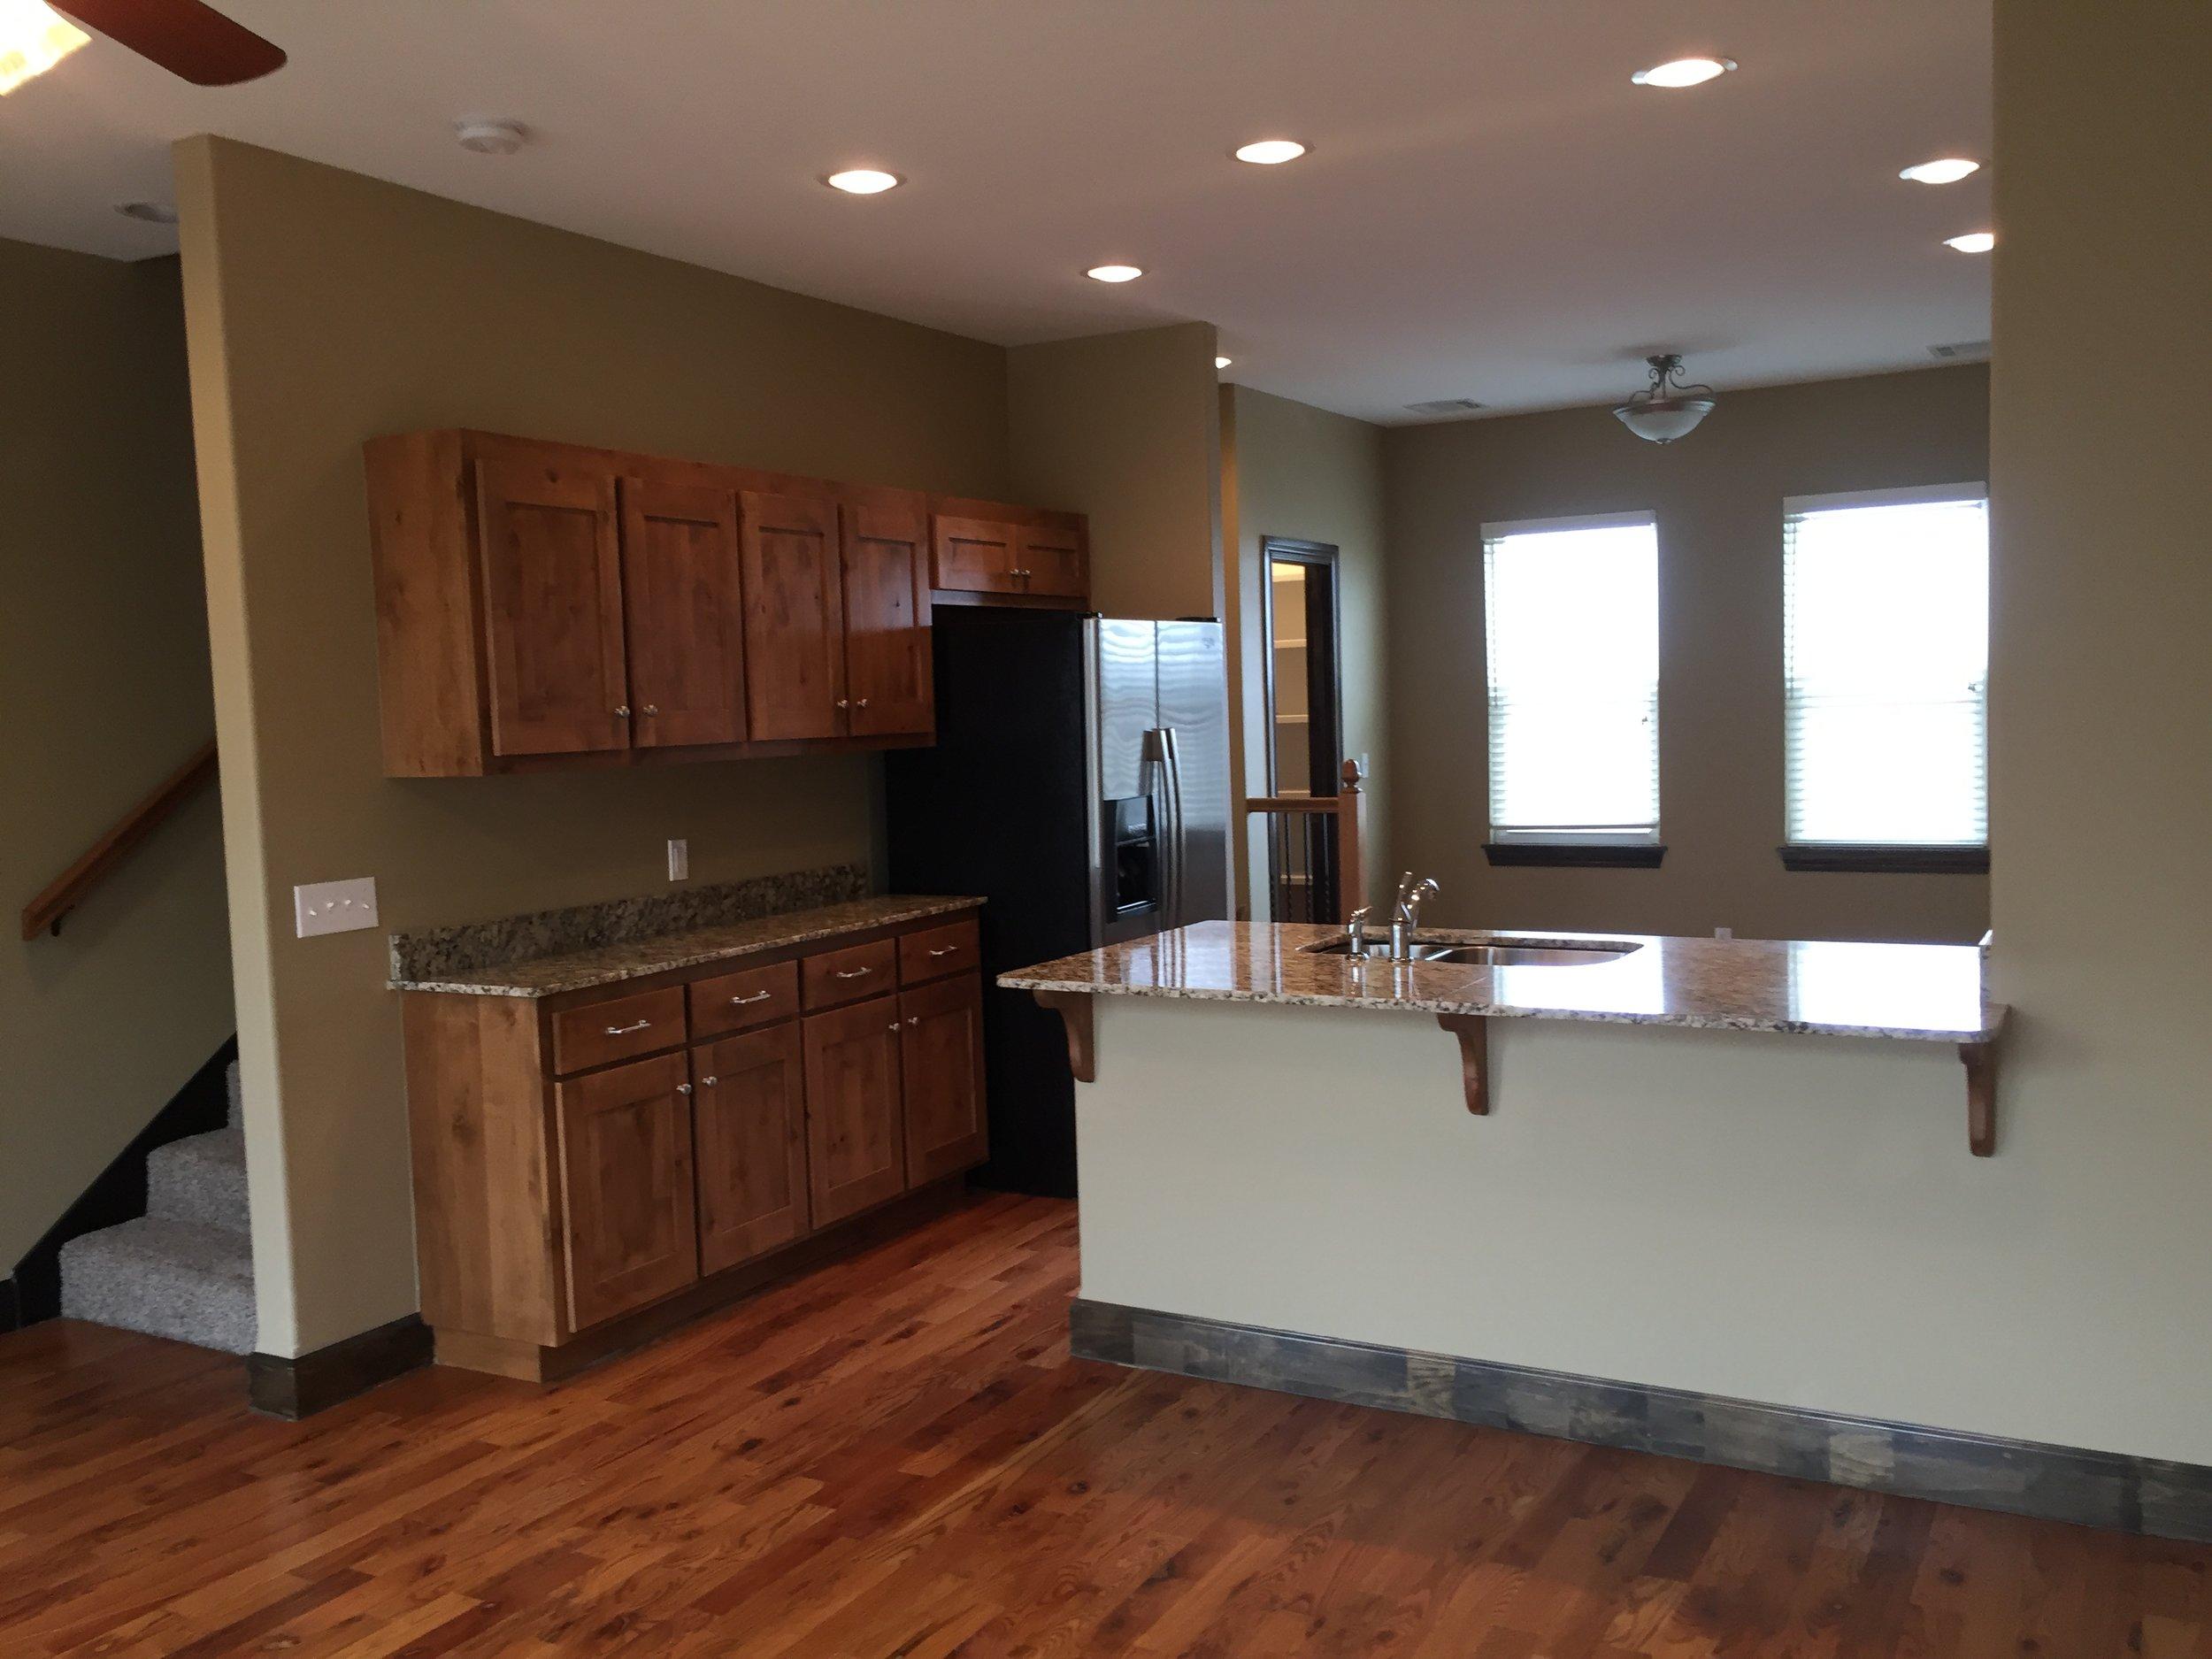 2011 se nova ave kitchen from living